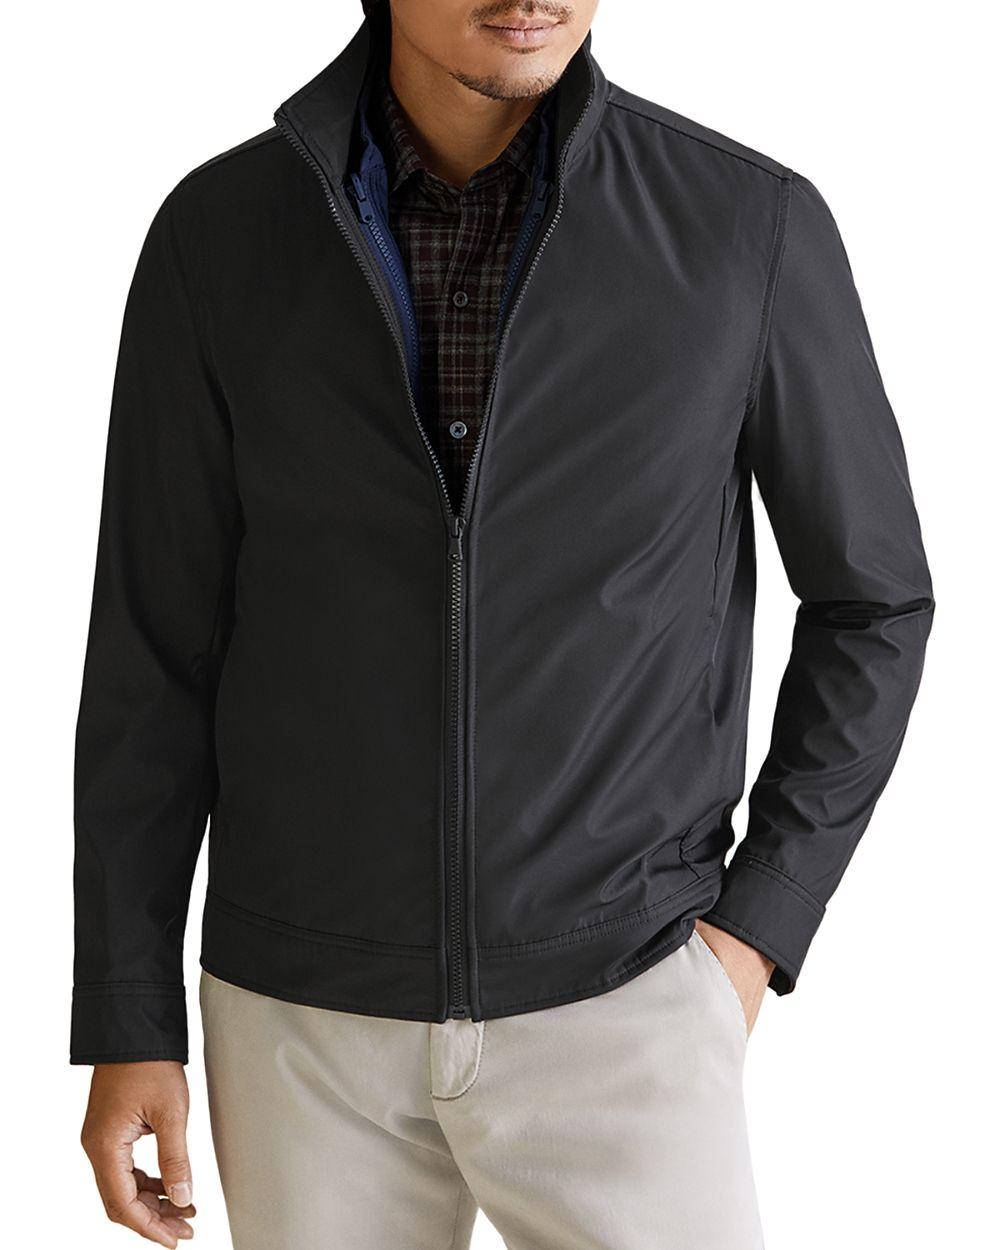 Zachary Prell Mens Jacket Deep Black Size XL Full-Zip Layered Lined